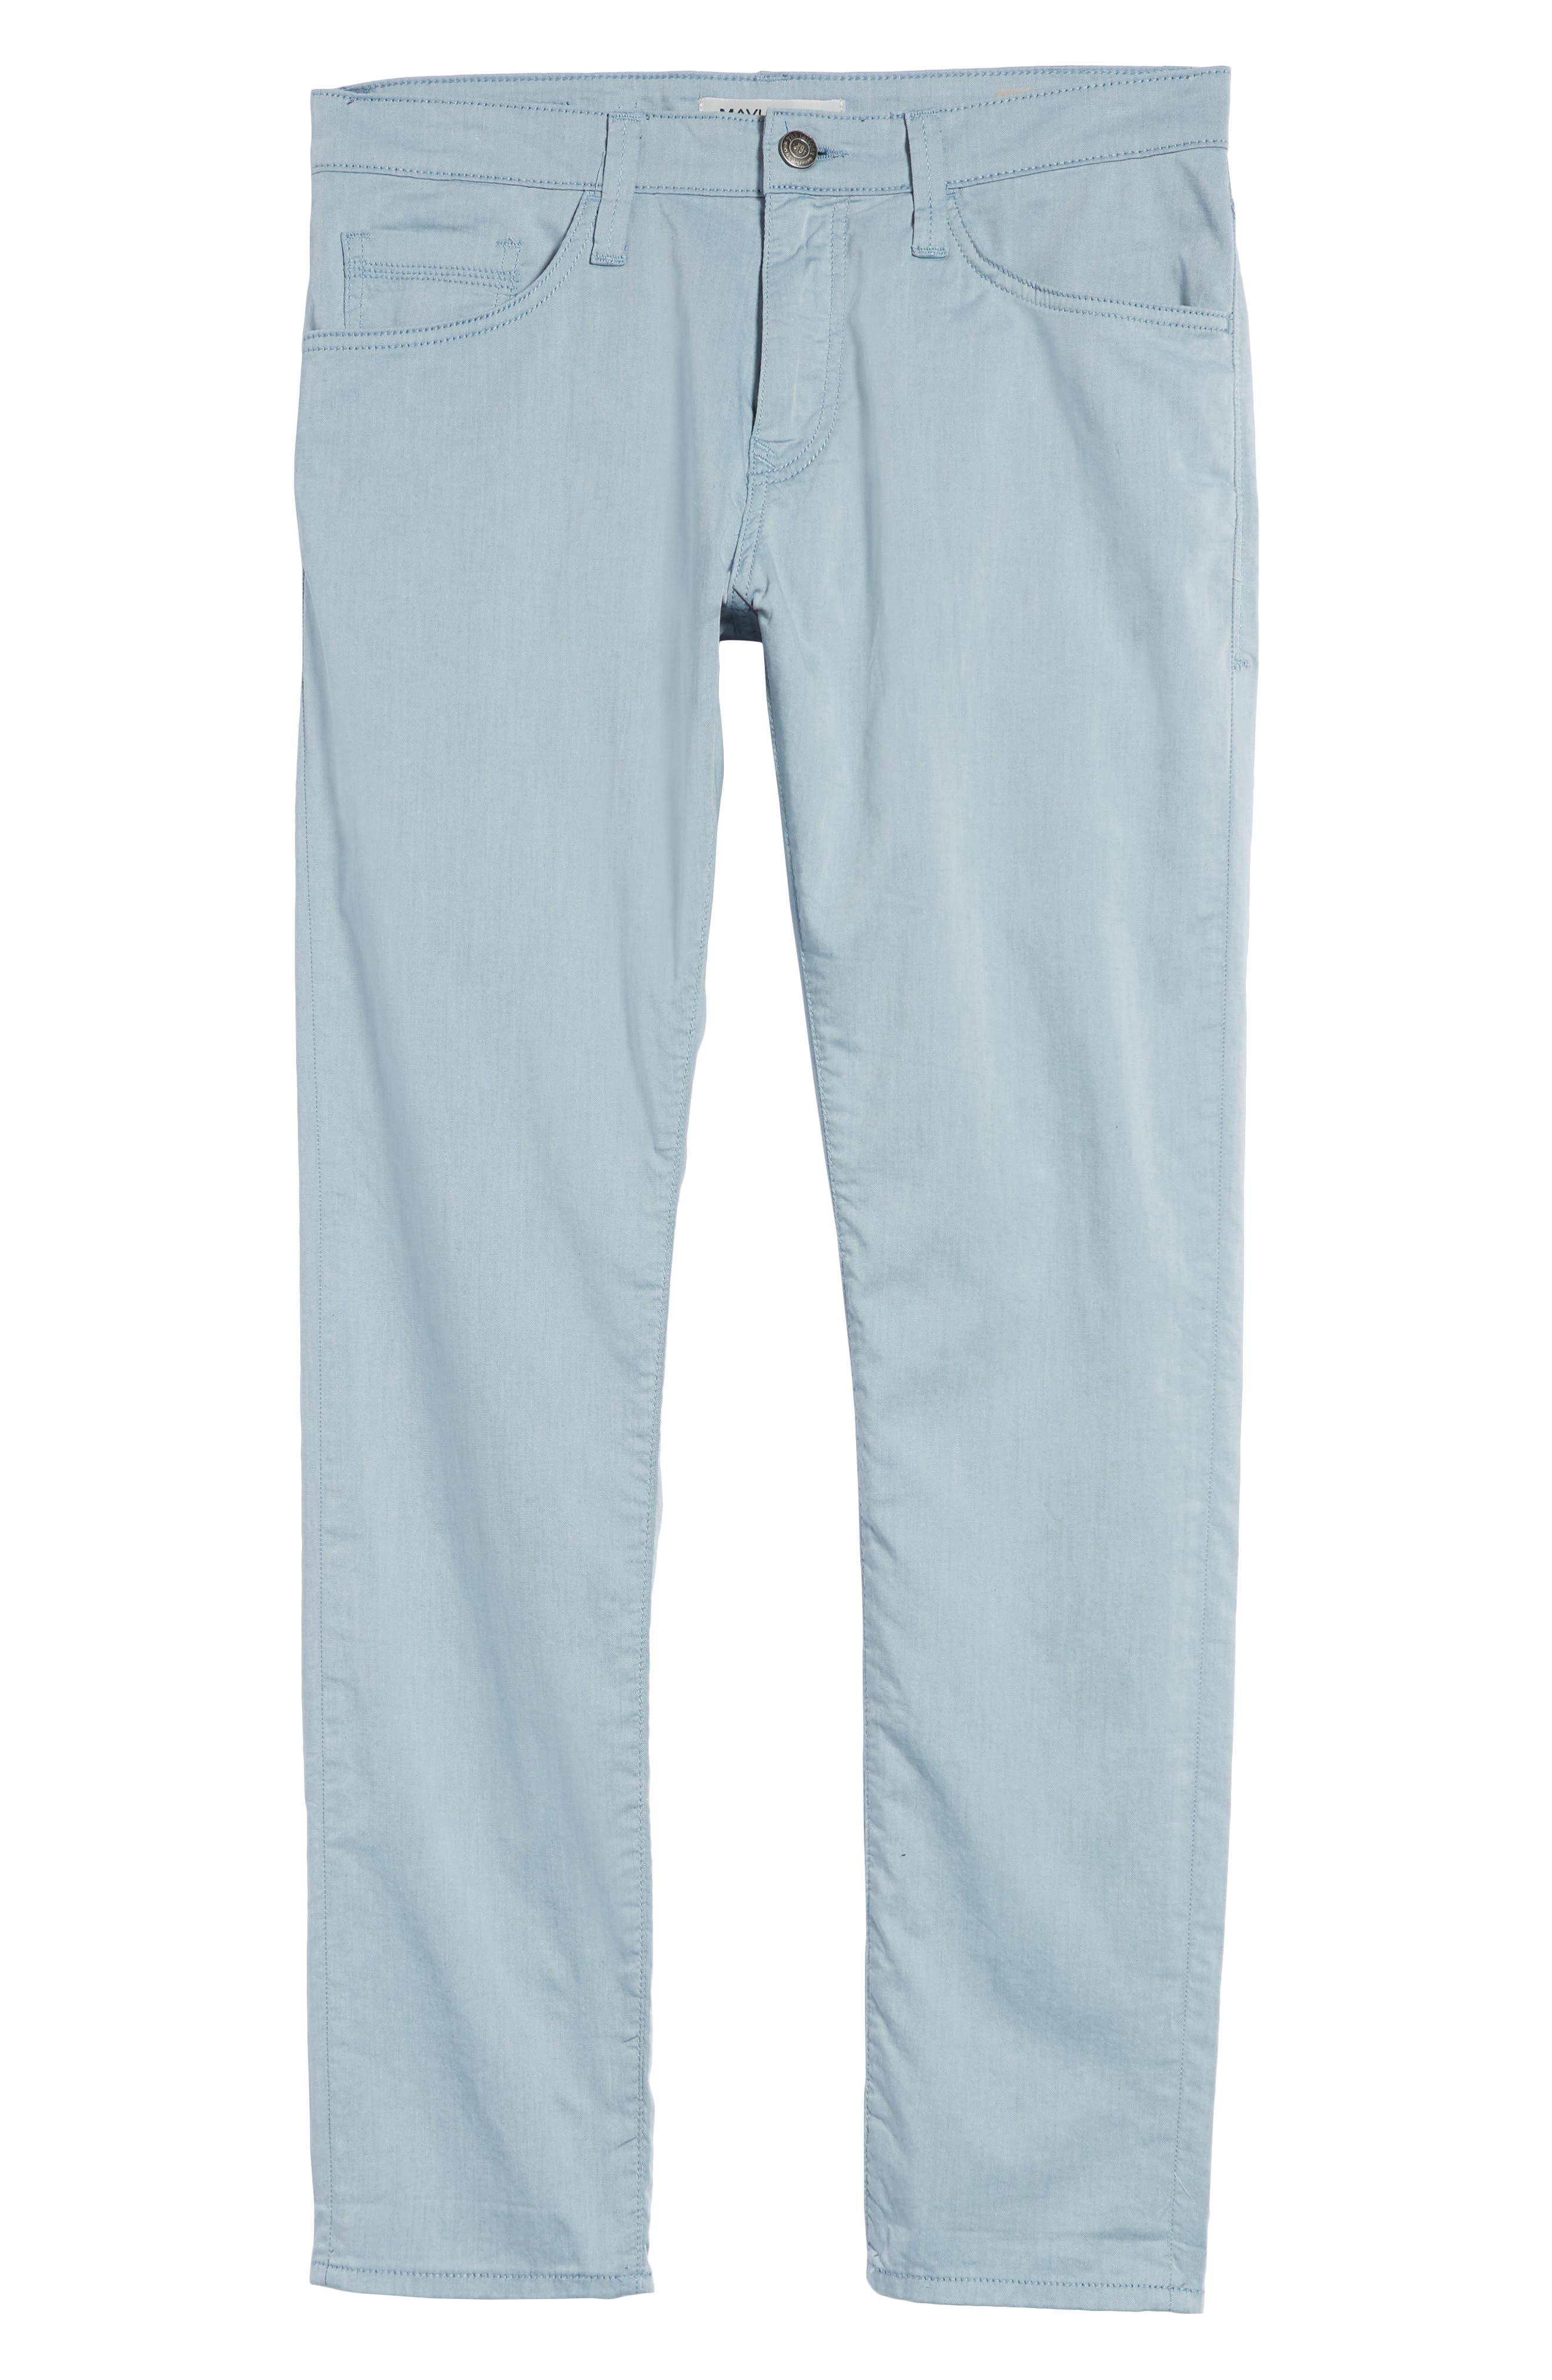 Jake Slim Fit Jeans,                             Alternate thumbnail 6, color,                             Blue Reversed